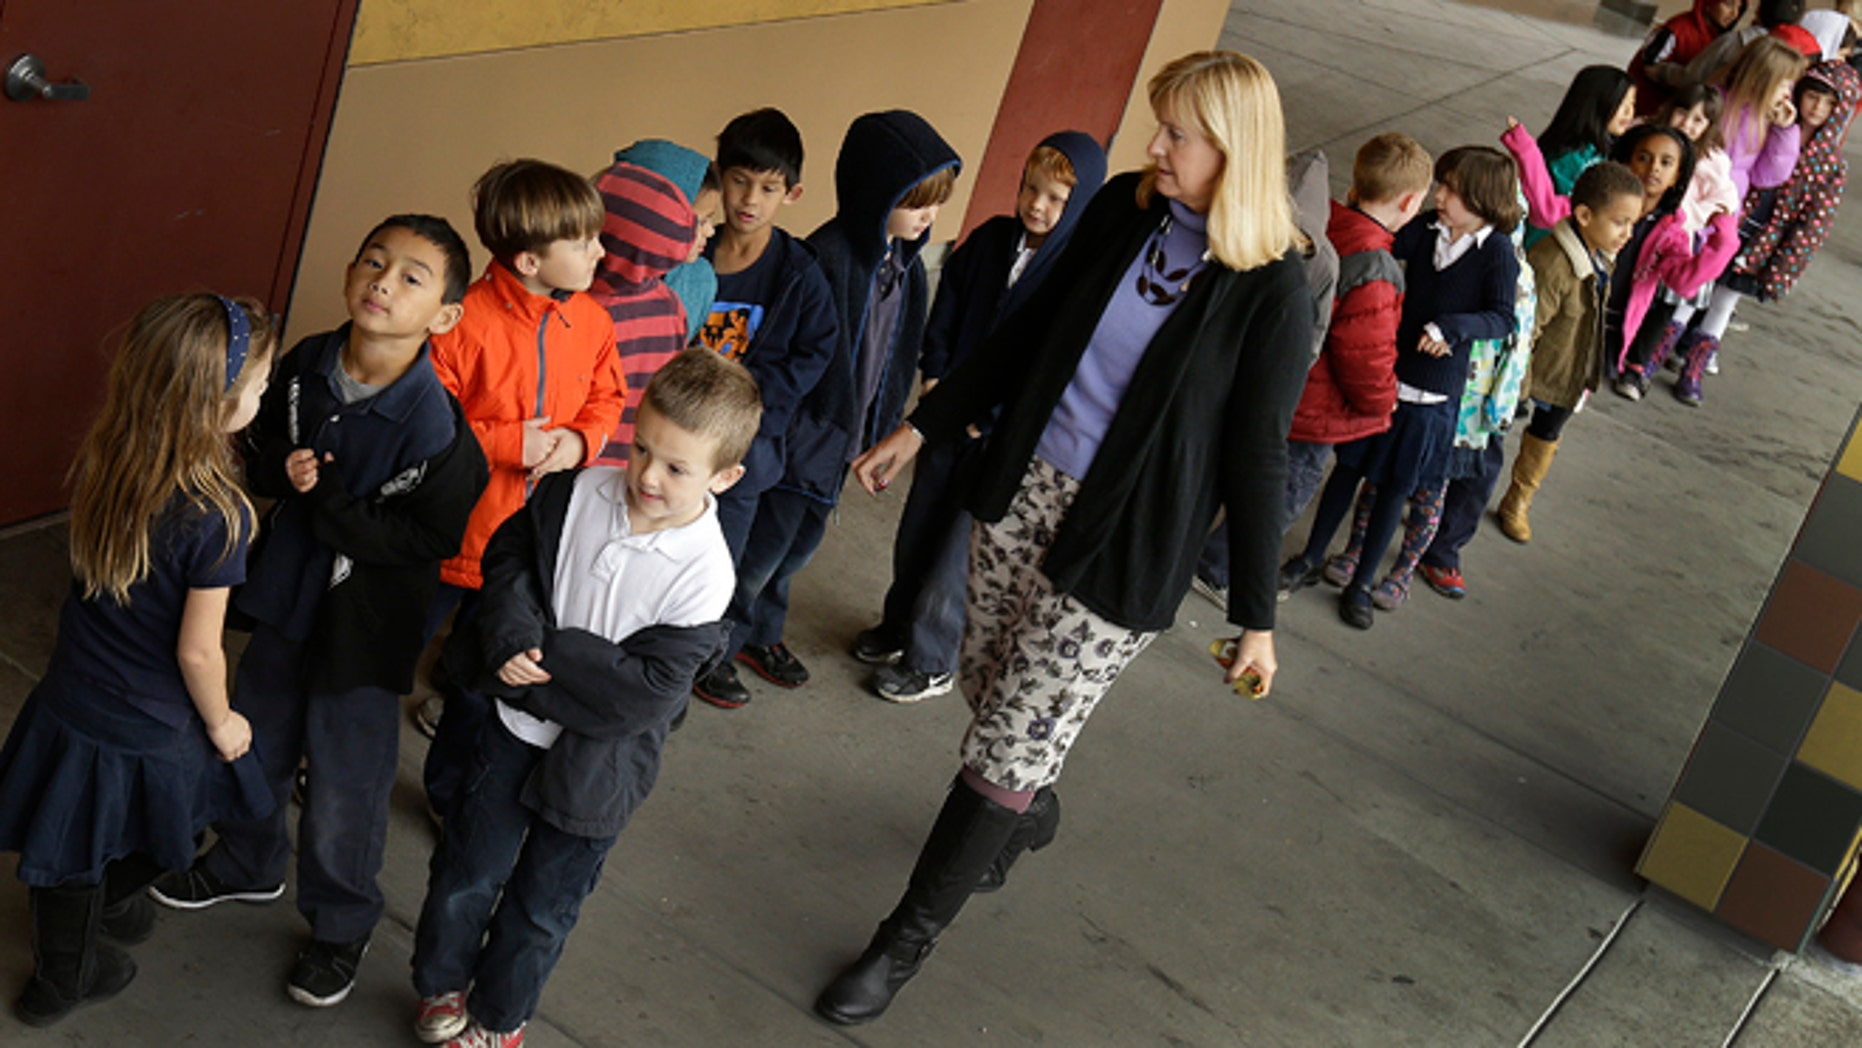 Jan. 24, 2013: First grade teacher Lynda Jensen walks her class of 30 children at the Willow Glenn Elementary School in San Jose, Calif.